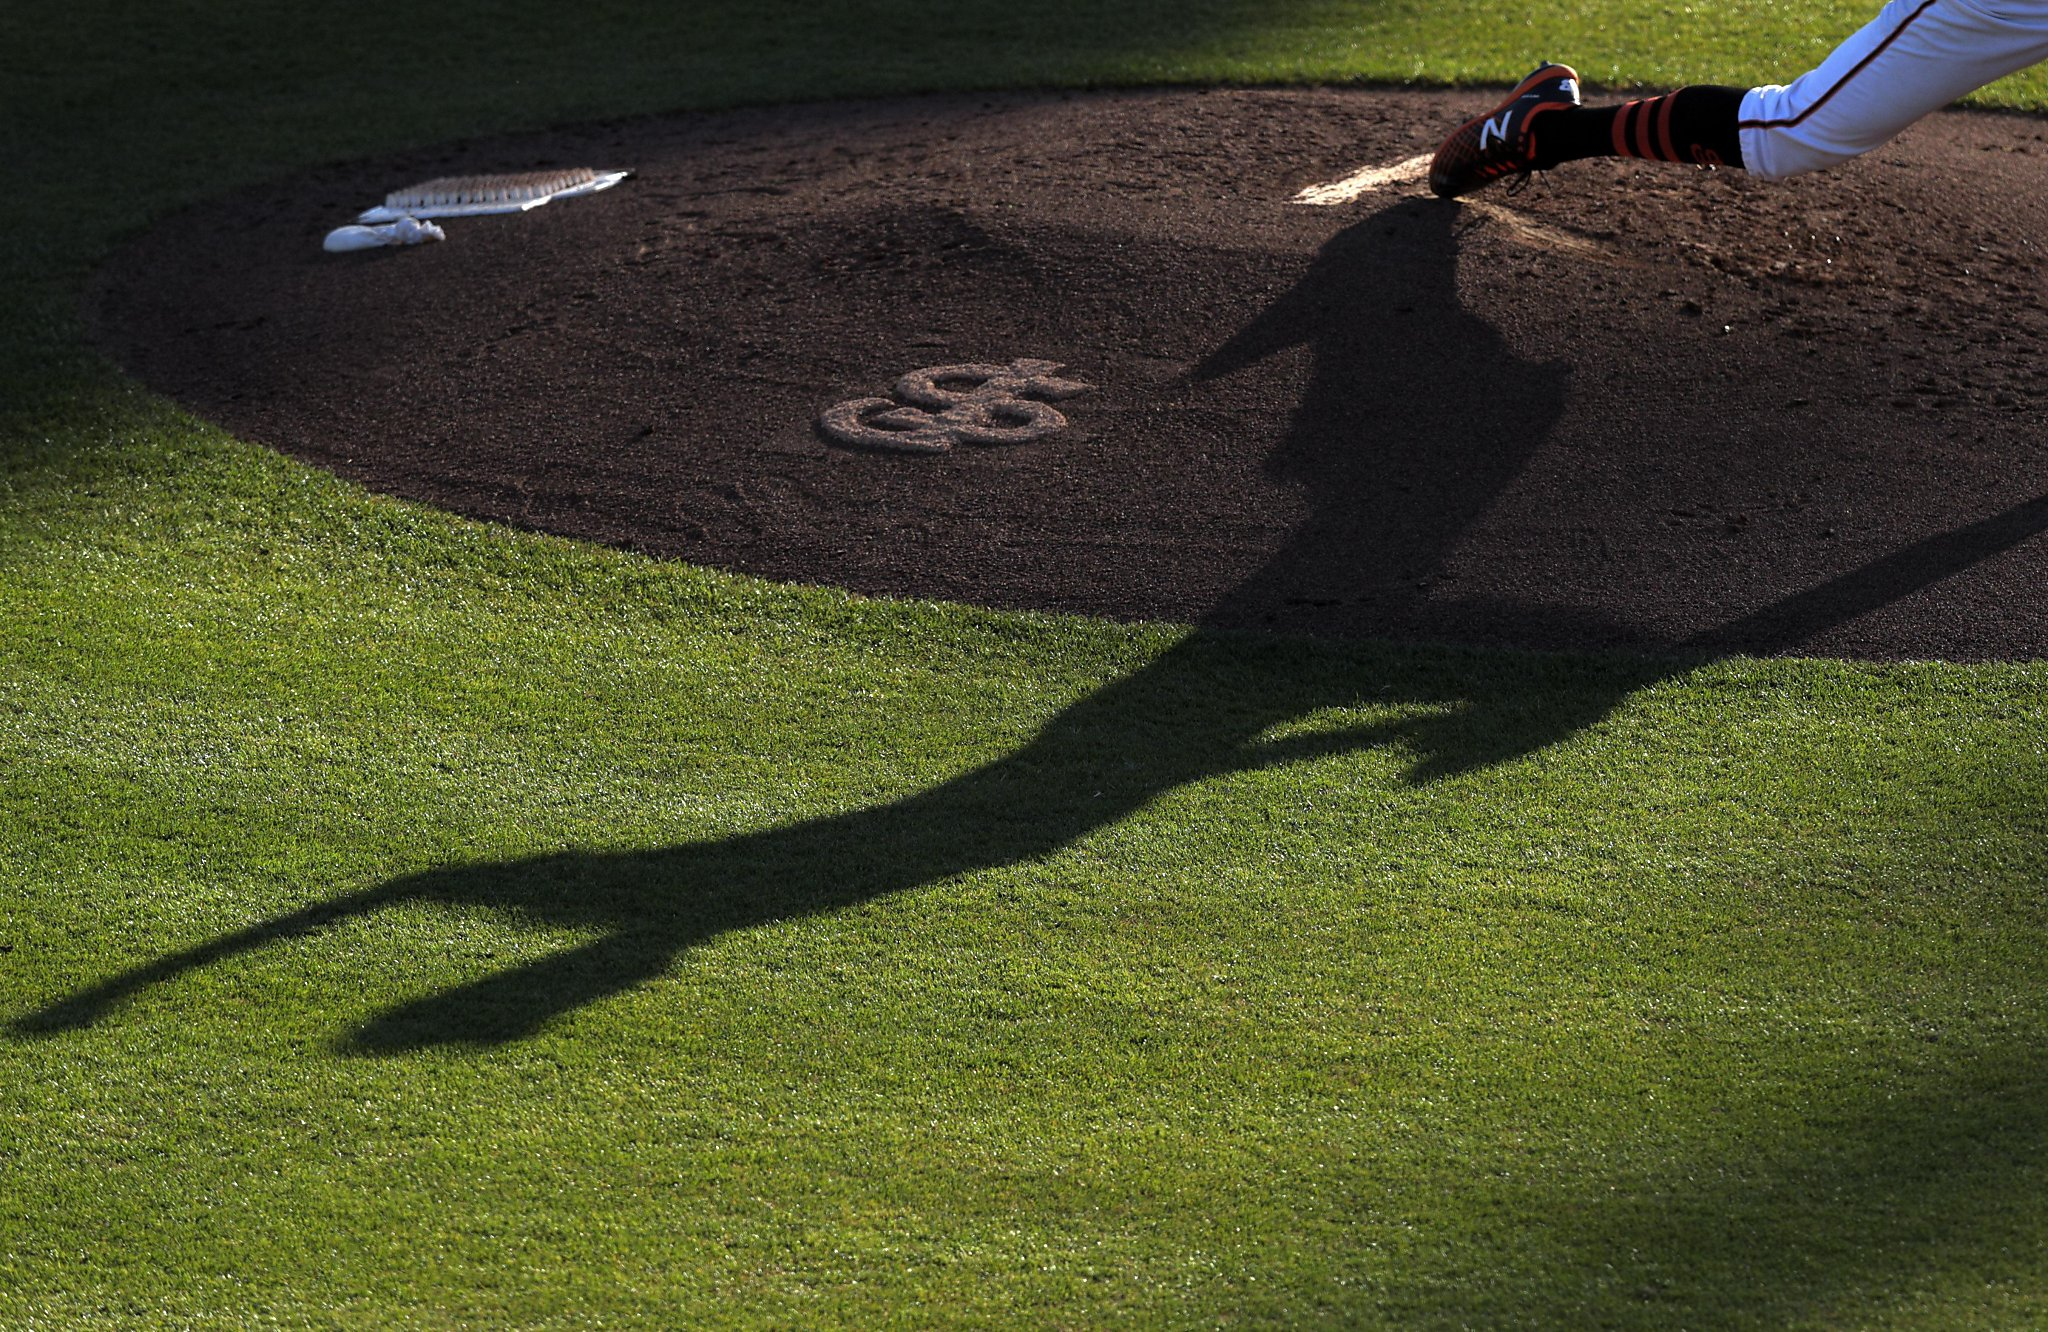 Surviving COVID and contraction, minor league baseball makes a comeback in San Jose